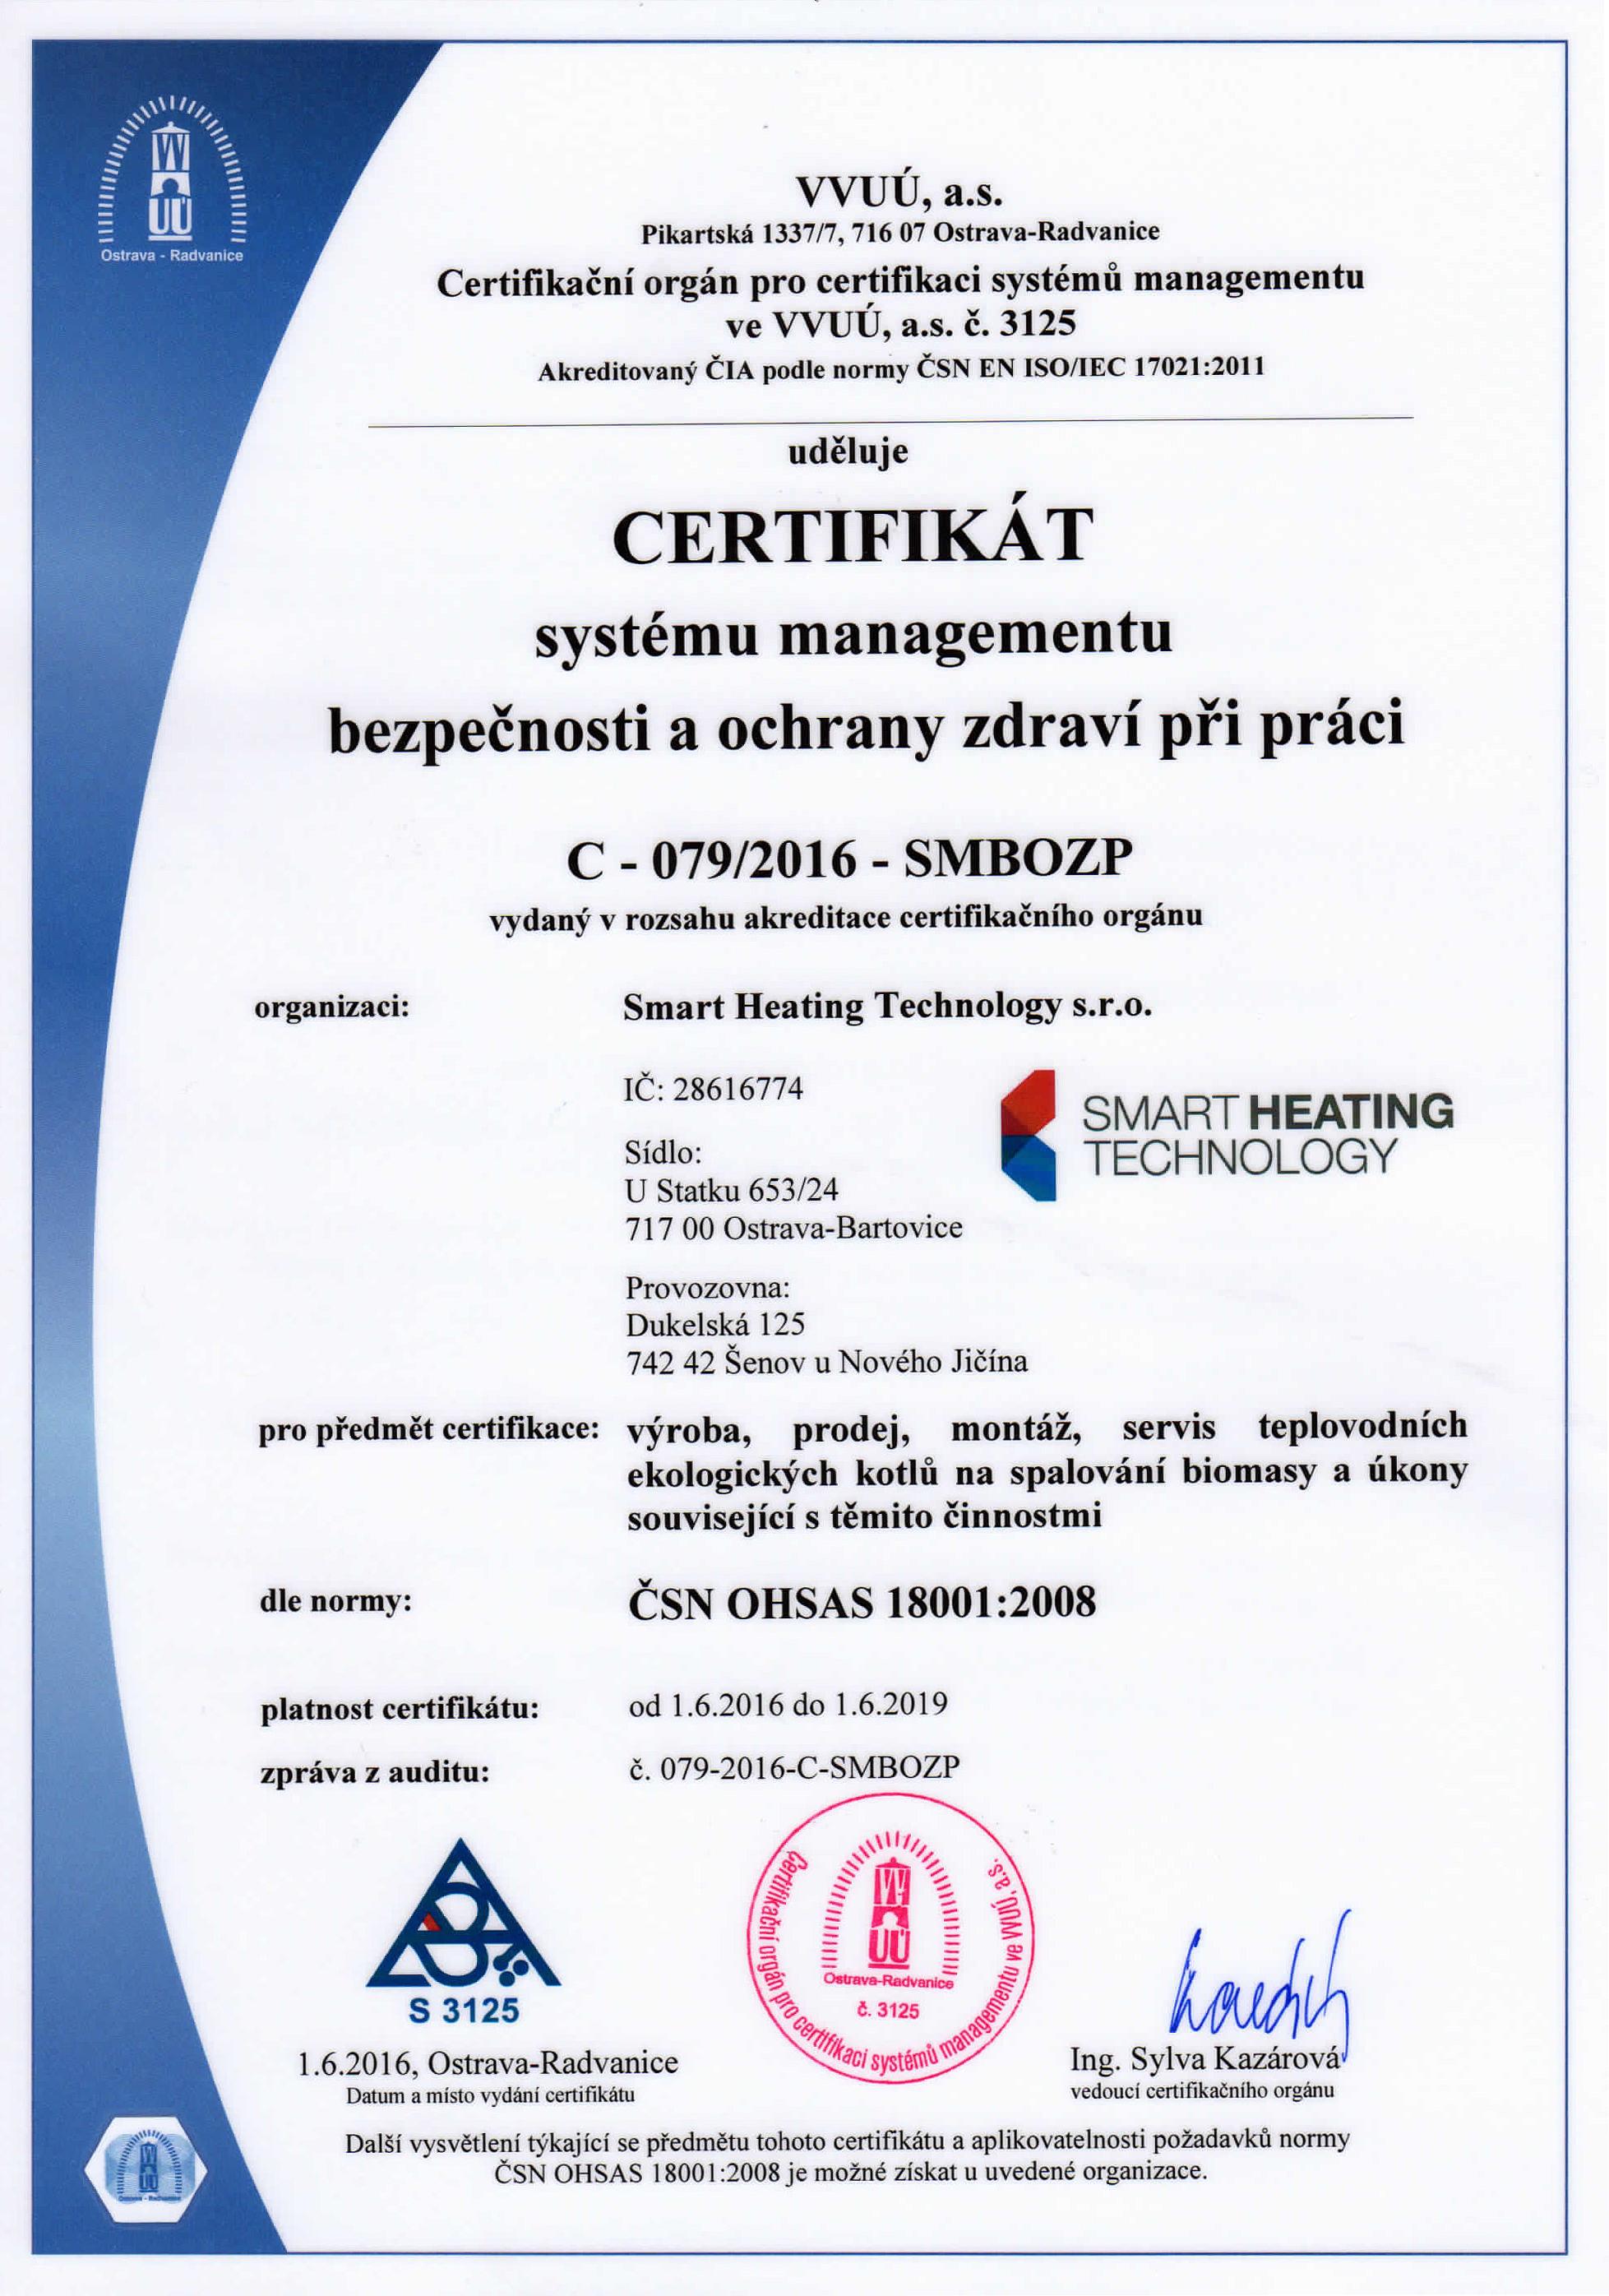 certifikat-c-079_2016-smbozp-cz